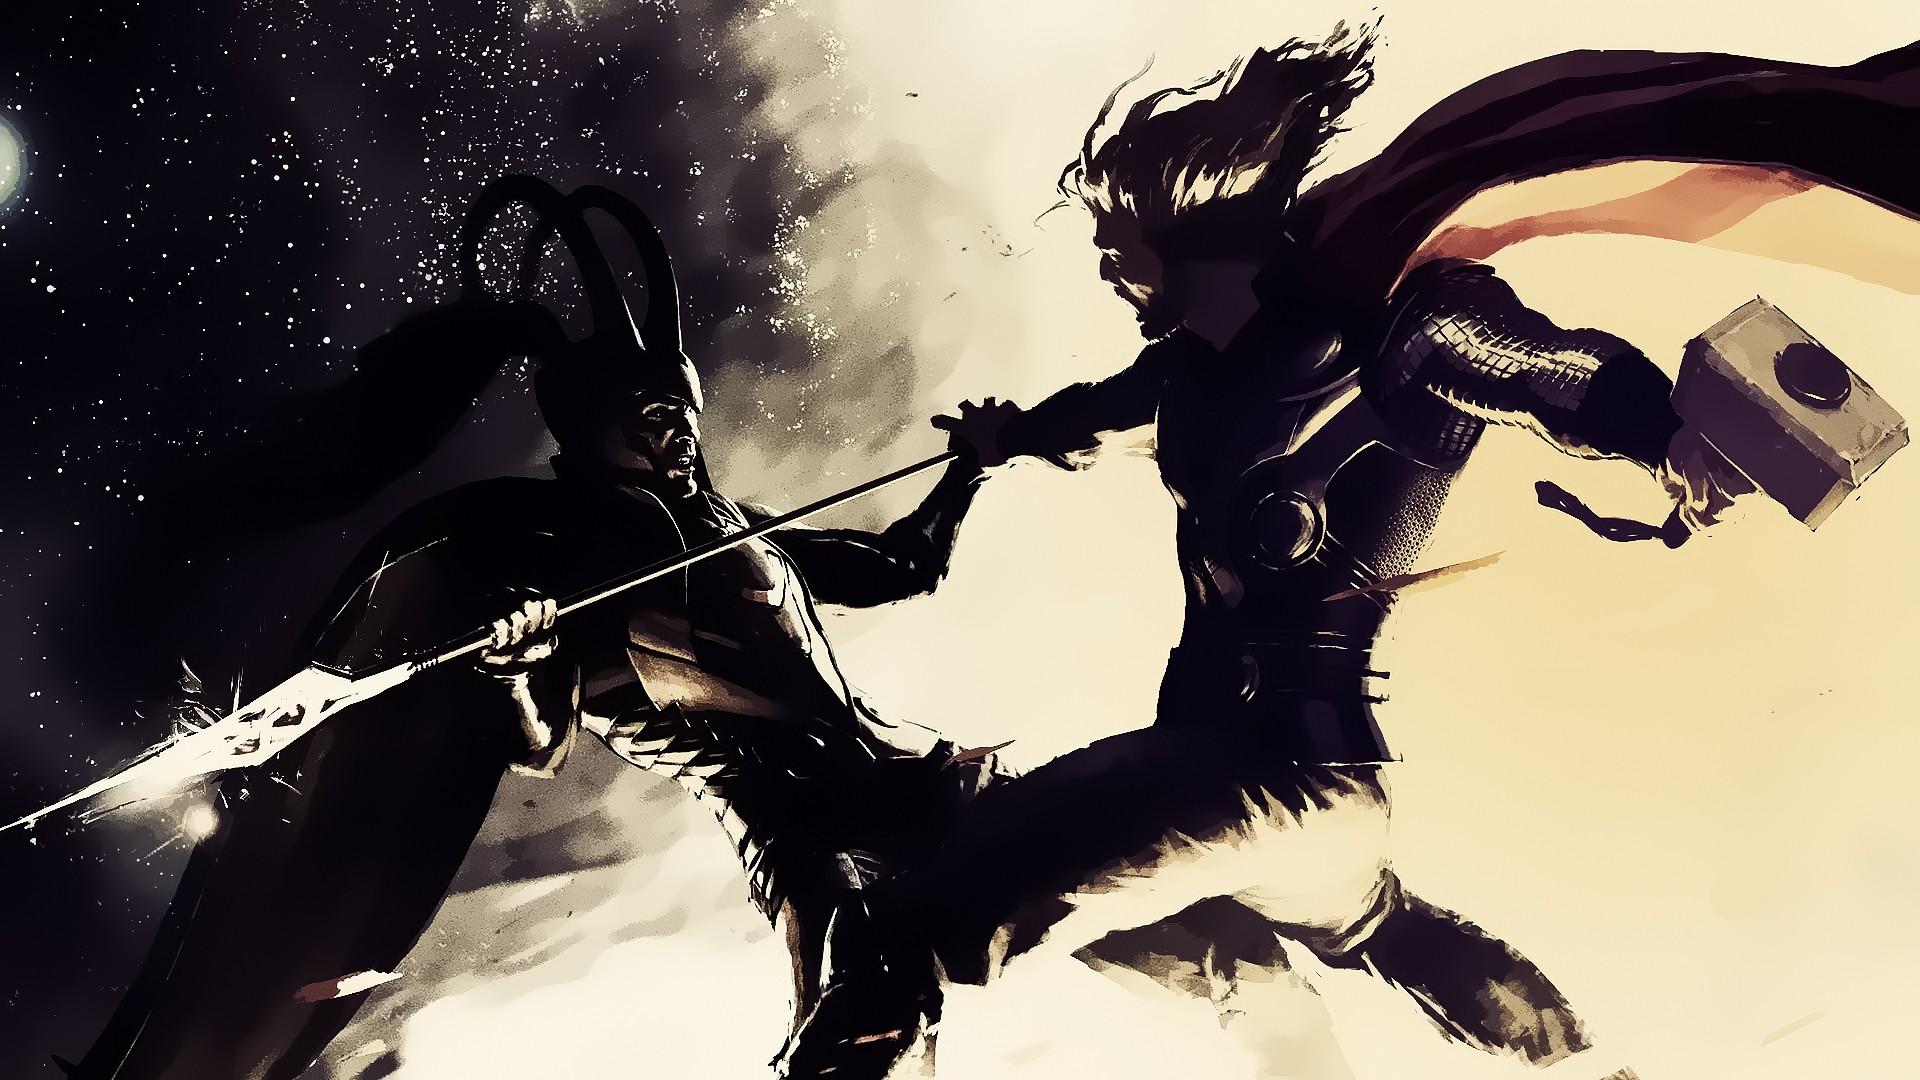 Most Inspiring Wallpaper Marvel Loki - illustration-Thor-anime-Marvel-Comics-Loki-sketch-computer-wallpaper-fictional-character-81172  Trends_1001865.jpg